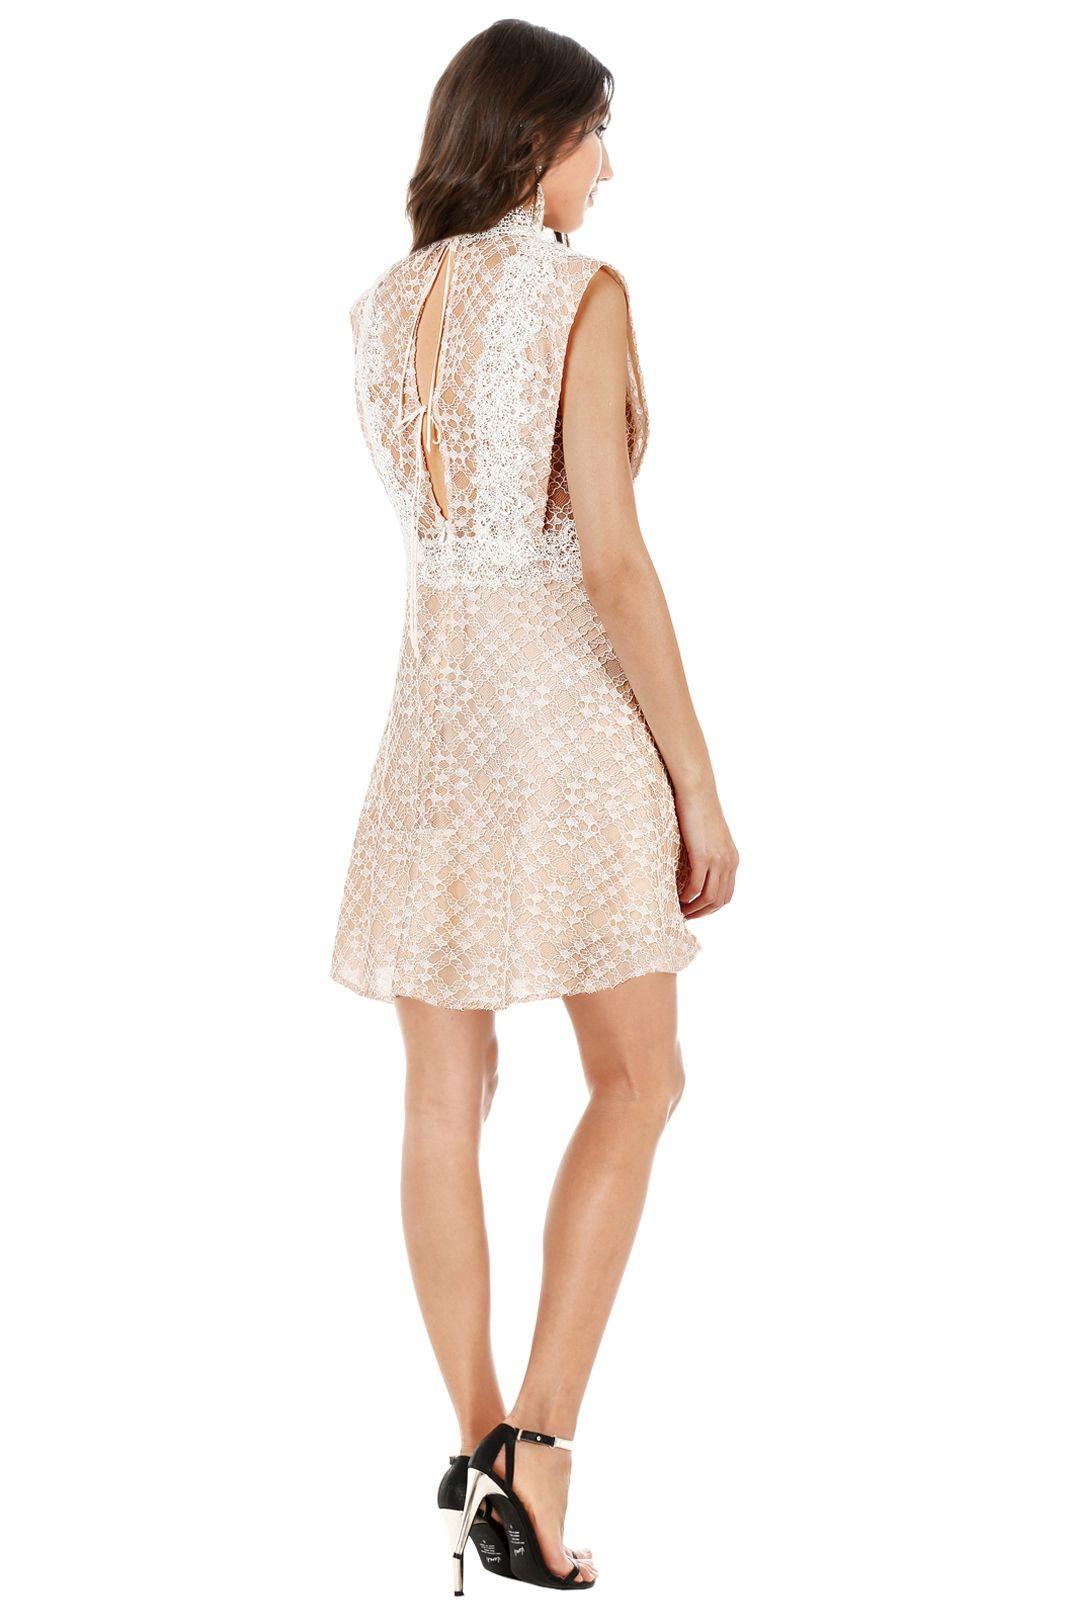 Sandro - Peaches Lace Dress - Cream - Back